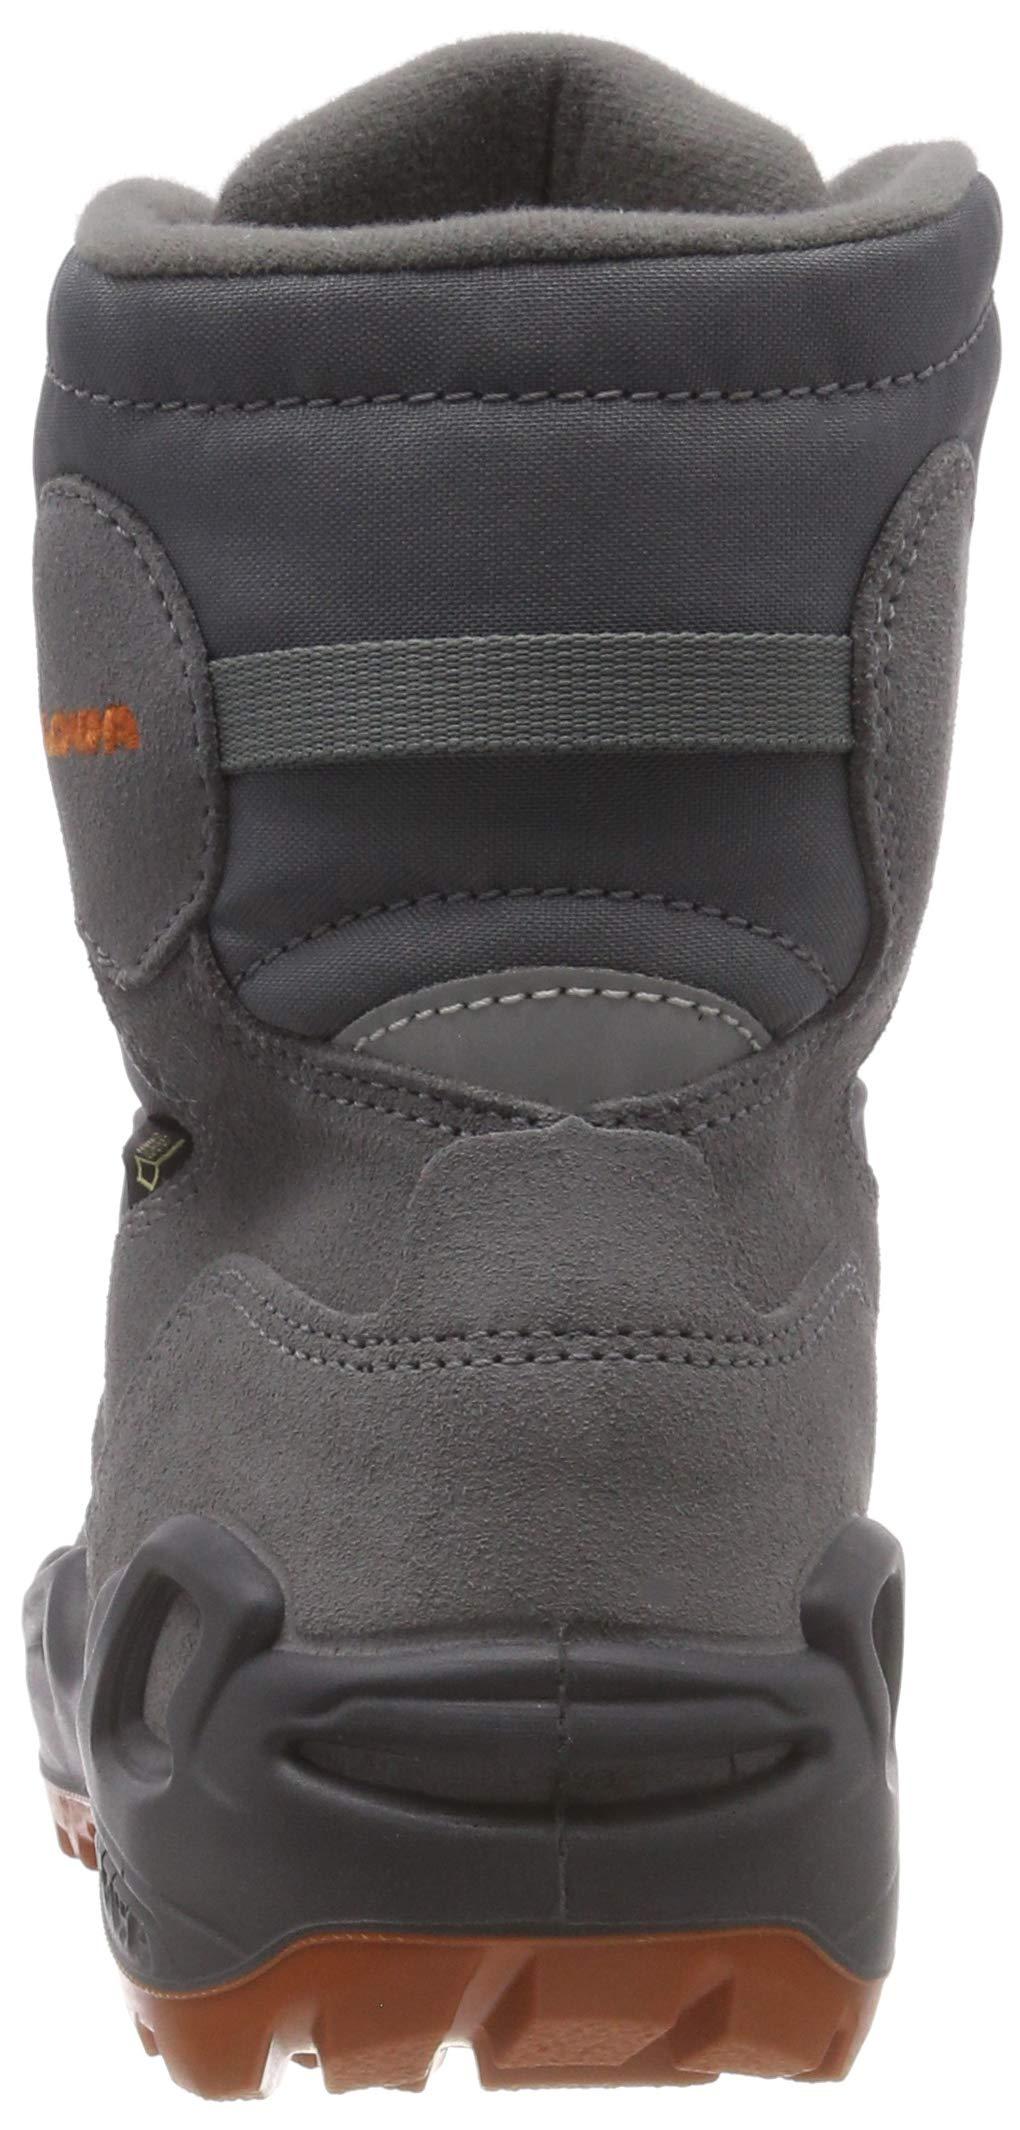 Lowa Unisex Kids Rufus Iii GTX Hi High Rise Hiking Boots 2